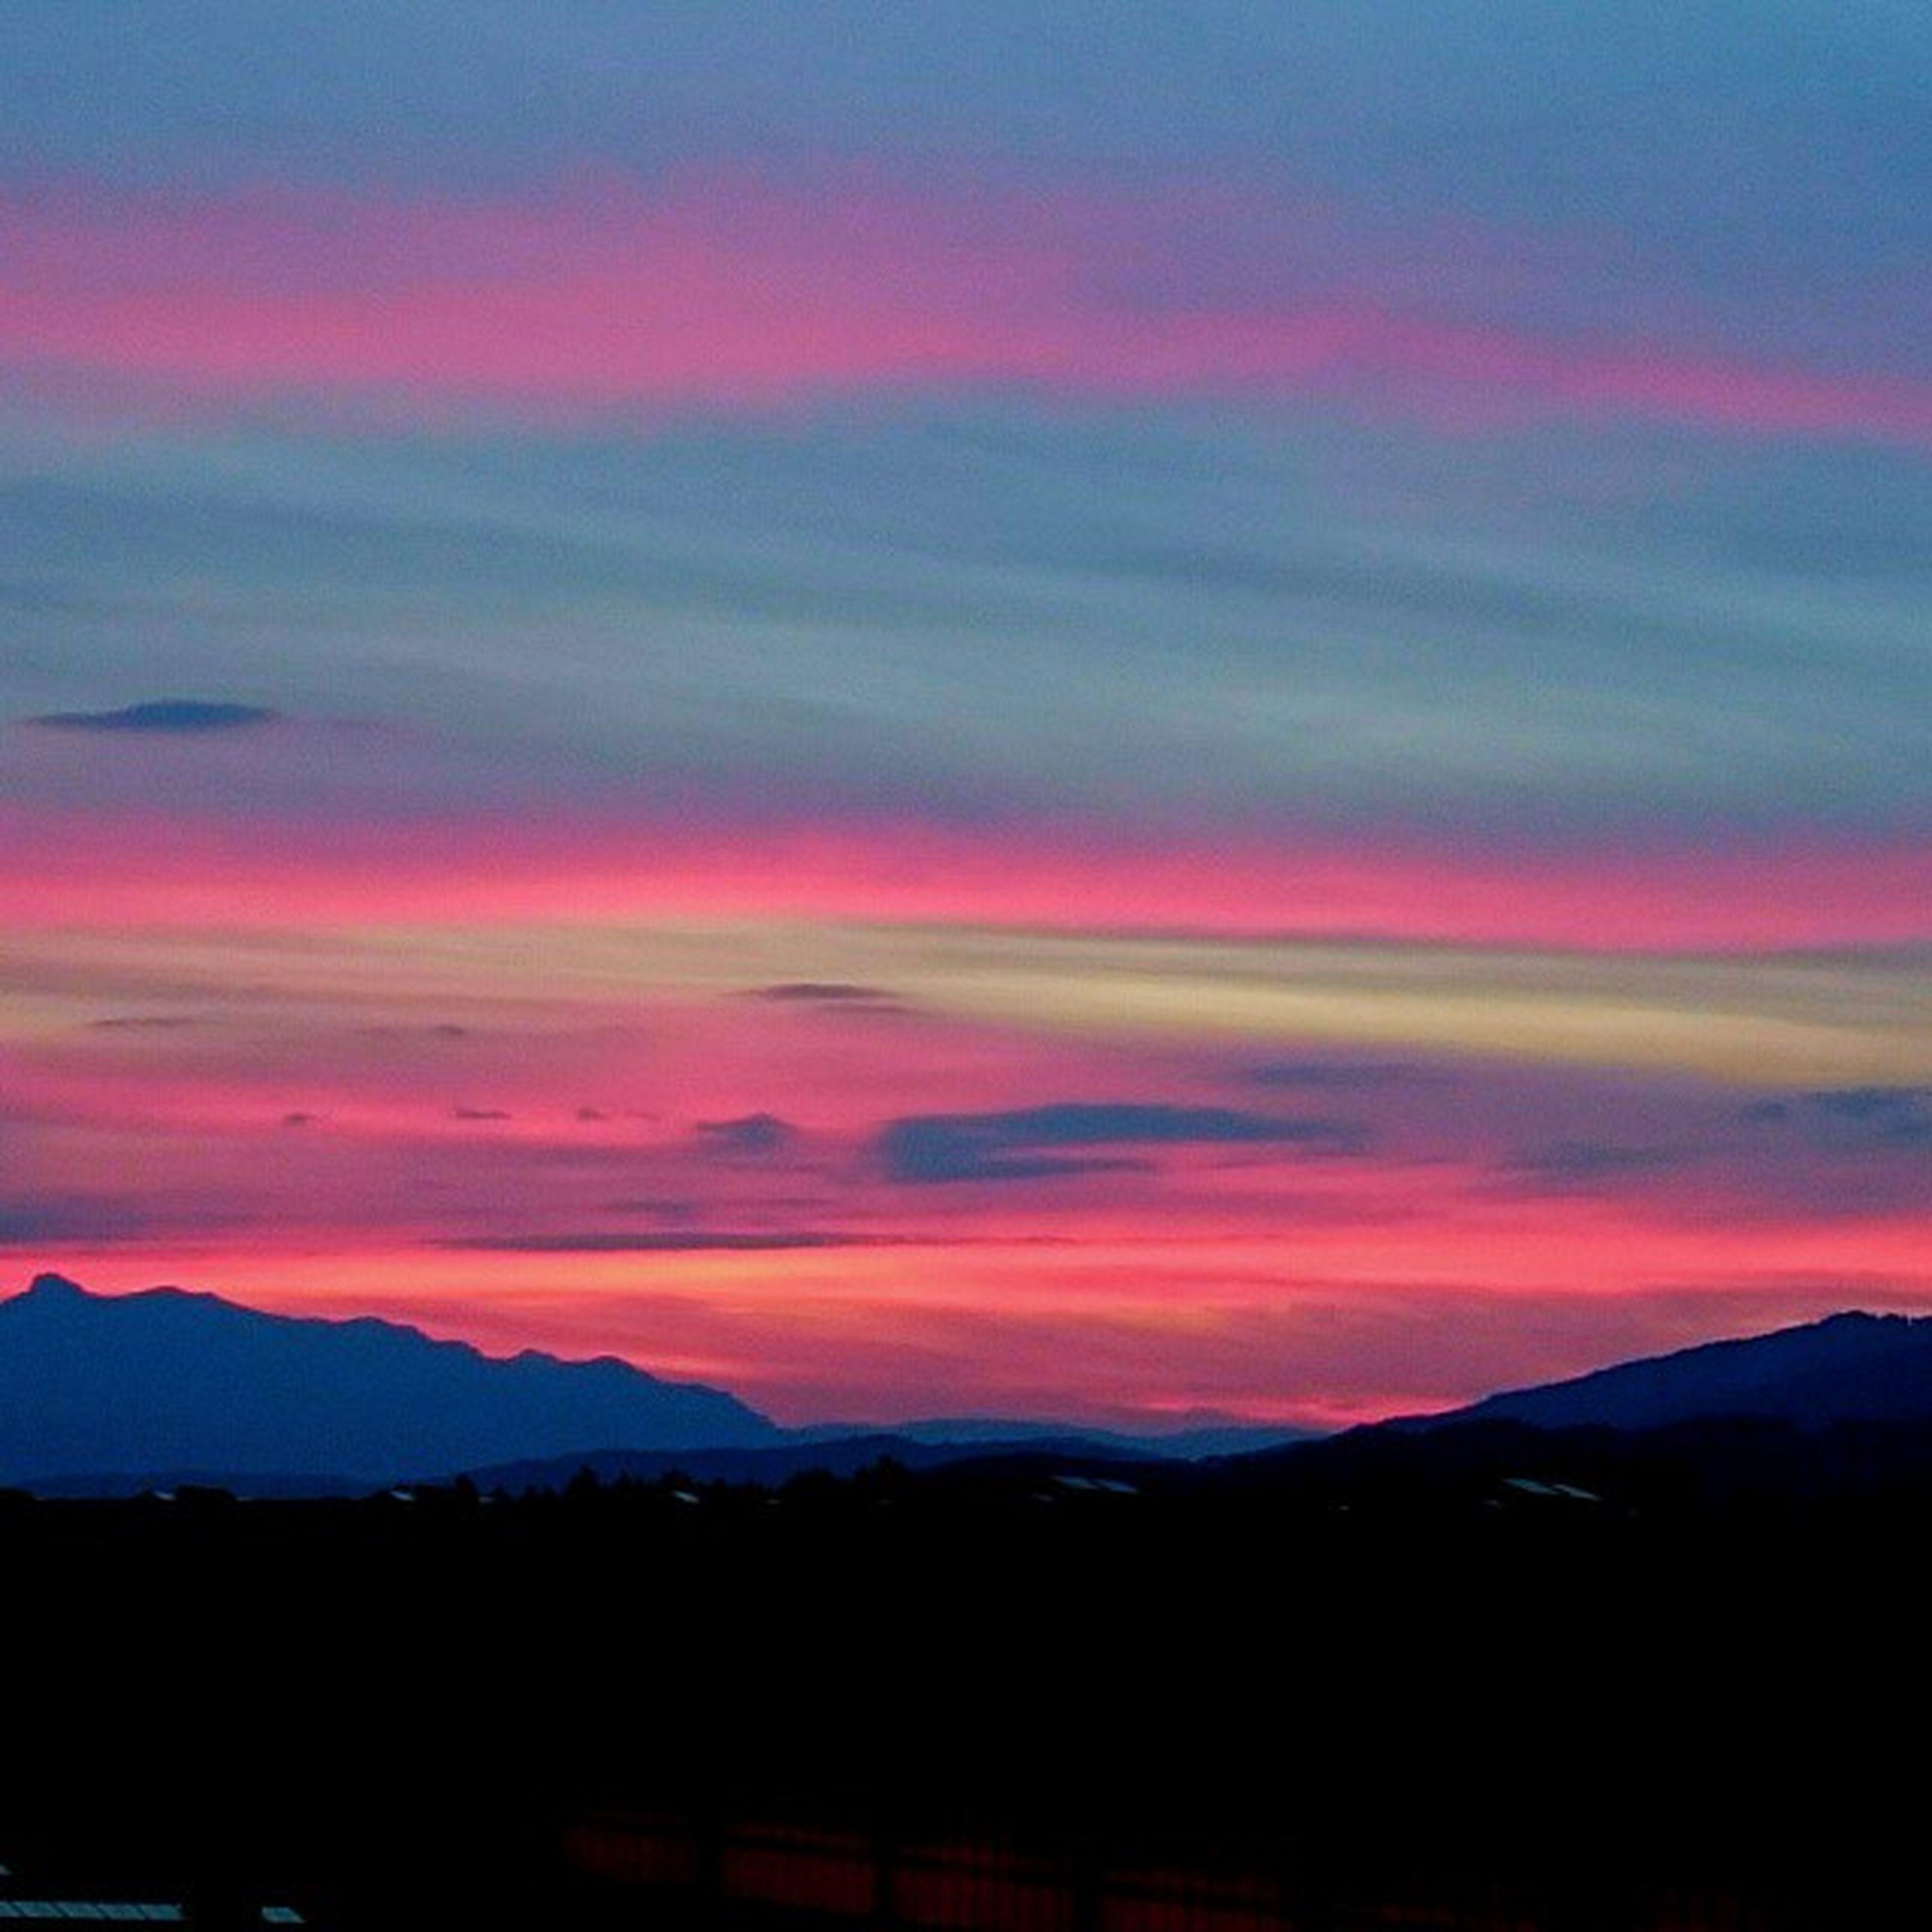 sunset, mountain, scenics, tranquil scene, beauty in nature, tranquility, silhouette, sky, mountain range, orange color, cloud - sky, landscape, nature, idyllic, dramatic sky, dusk, cloud, majestic, non-urban scene, cloudy